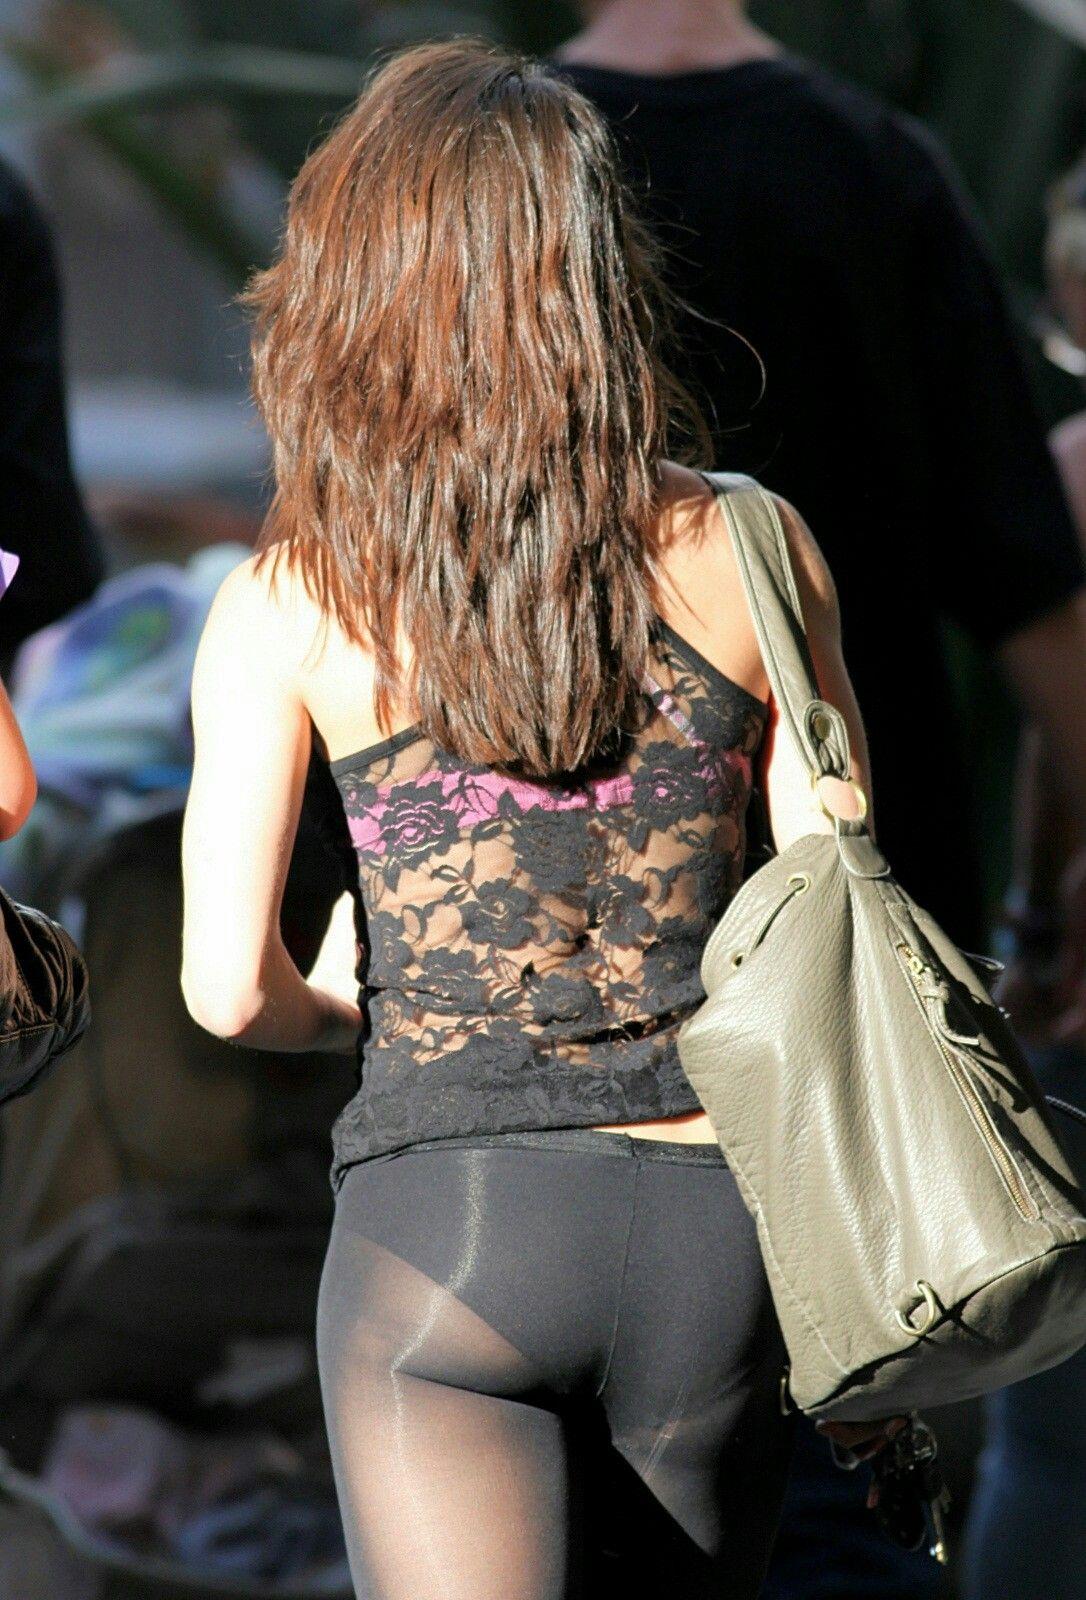 Panty clad ass pics — photo 7